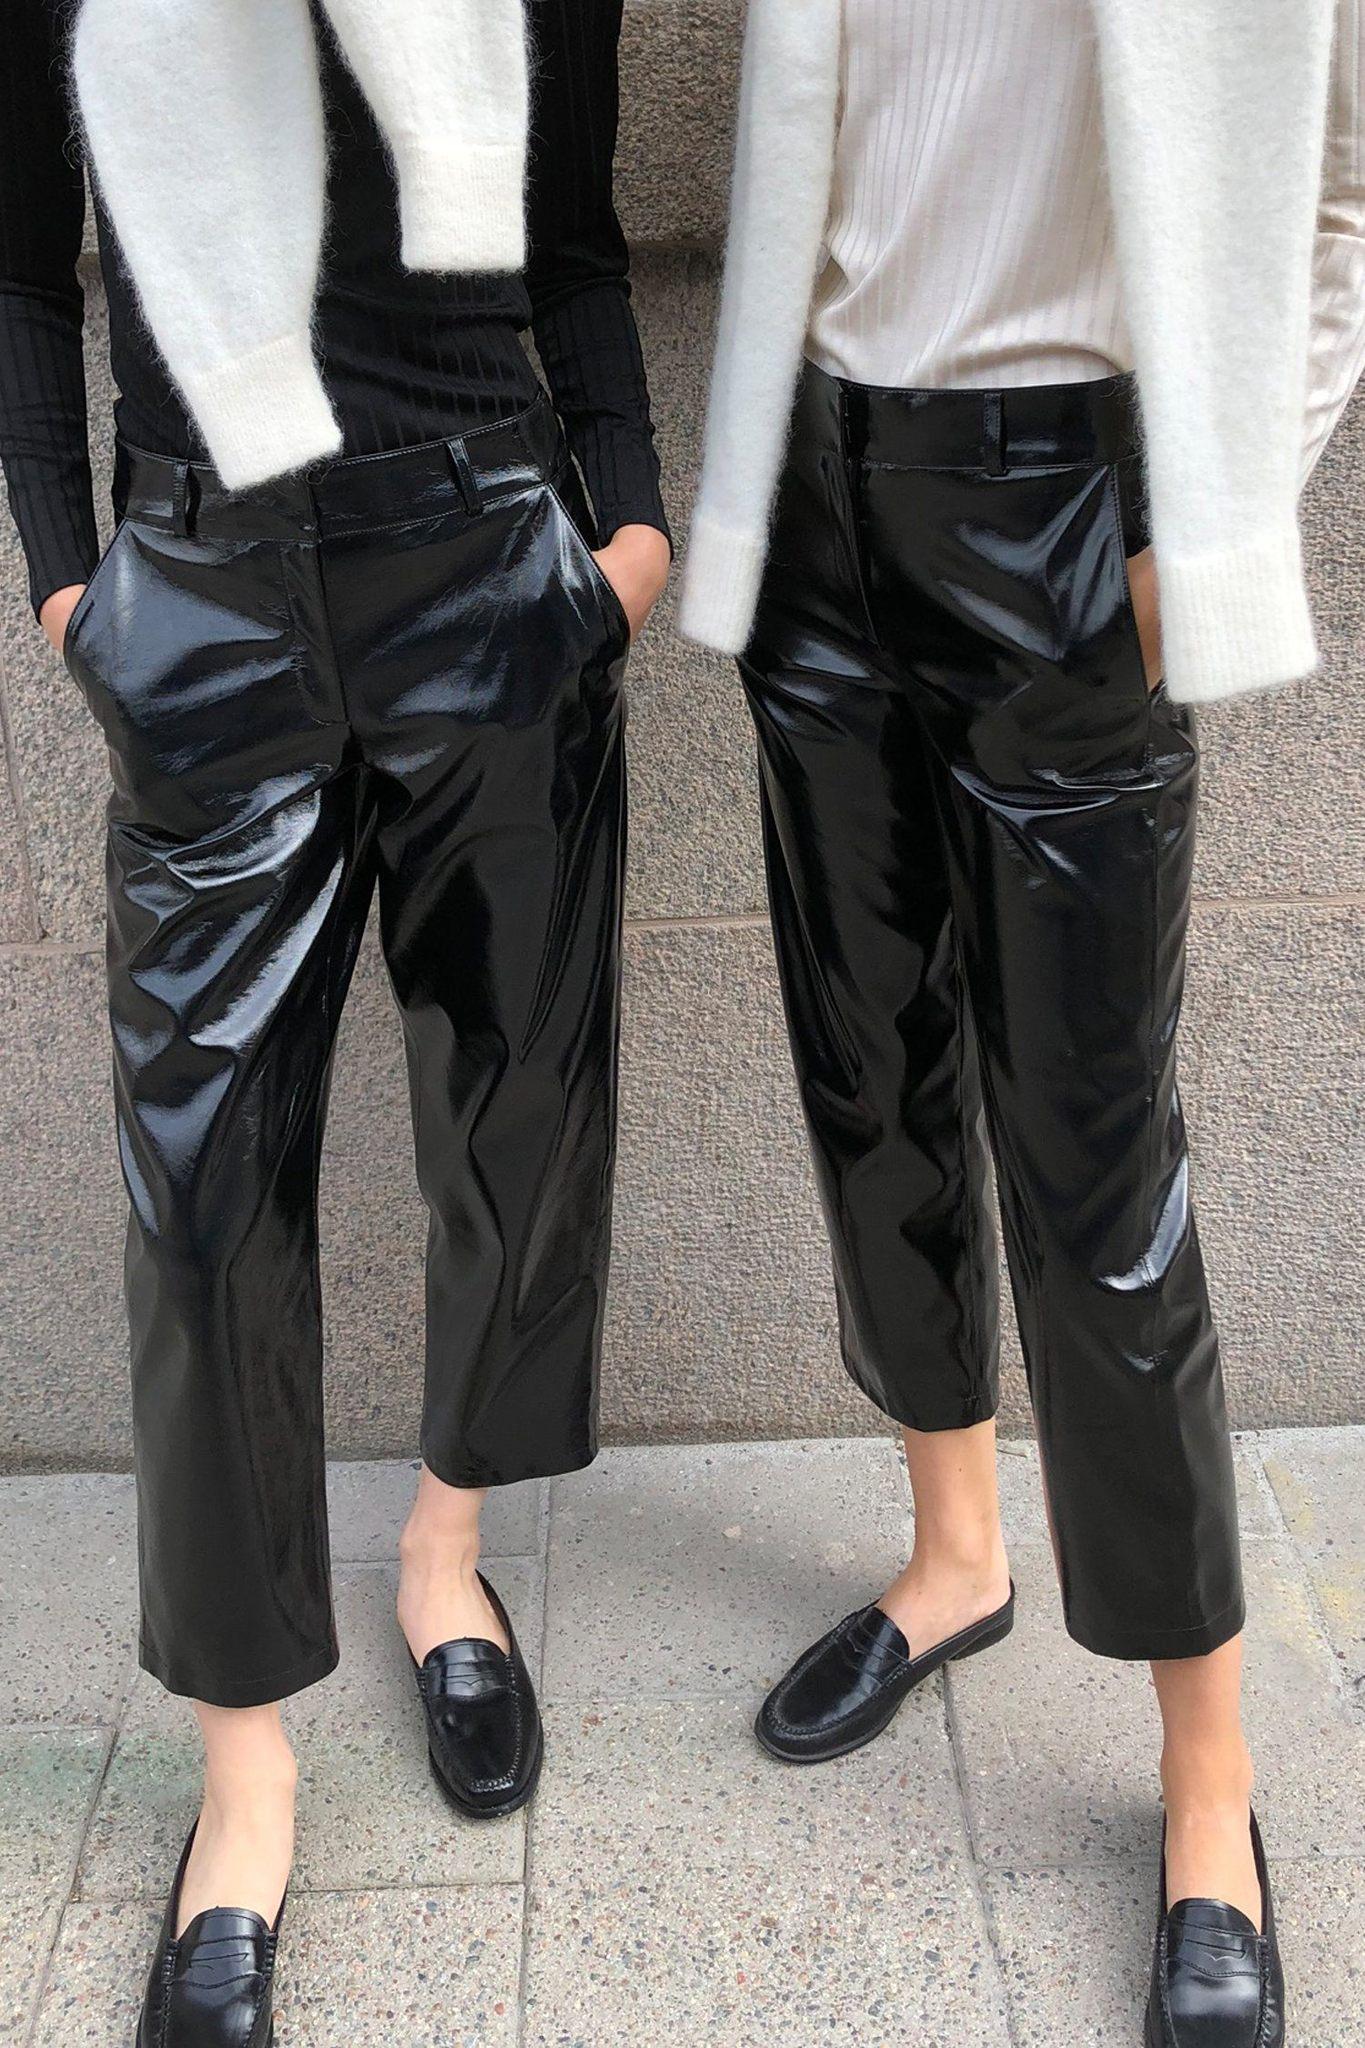 verde-trousers-black-trousers-stylein-627088_2048x2048.jpg